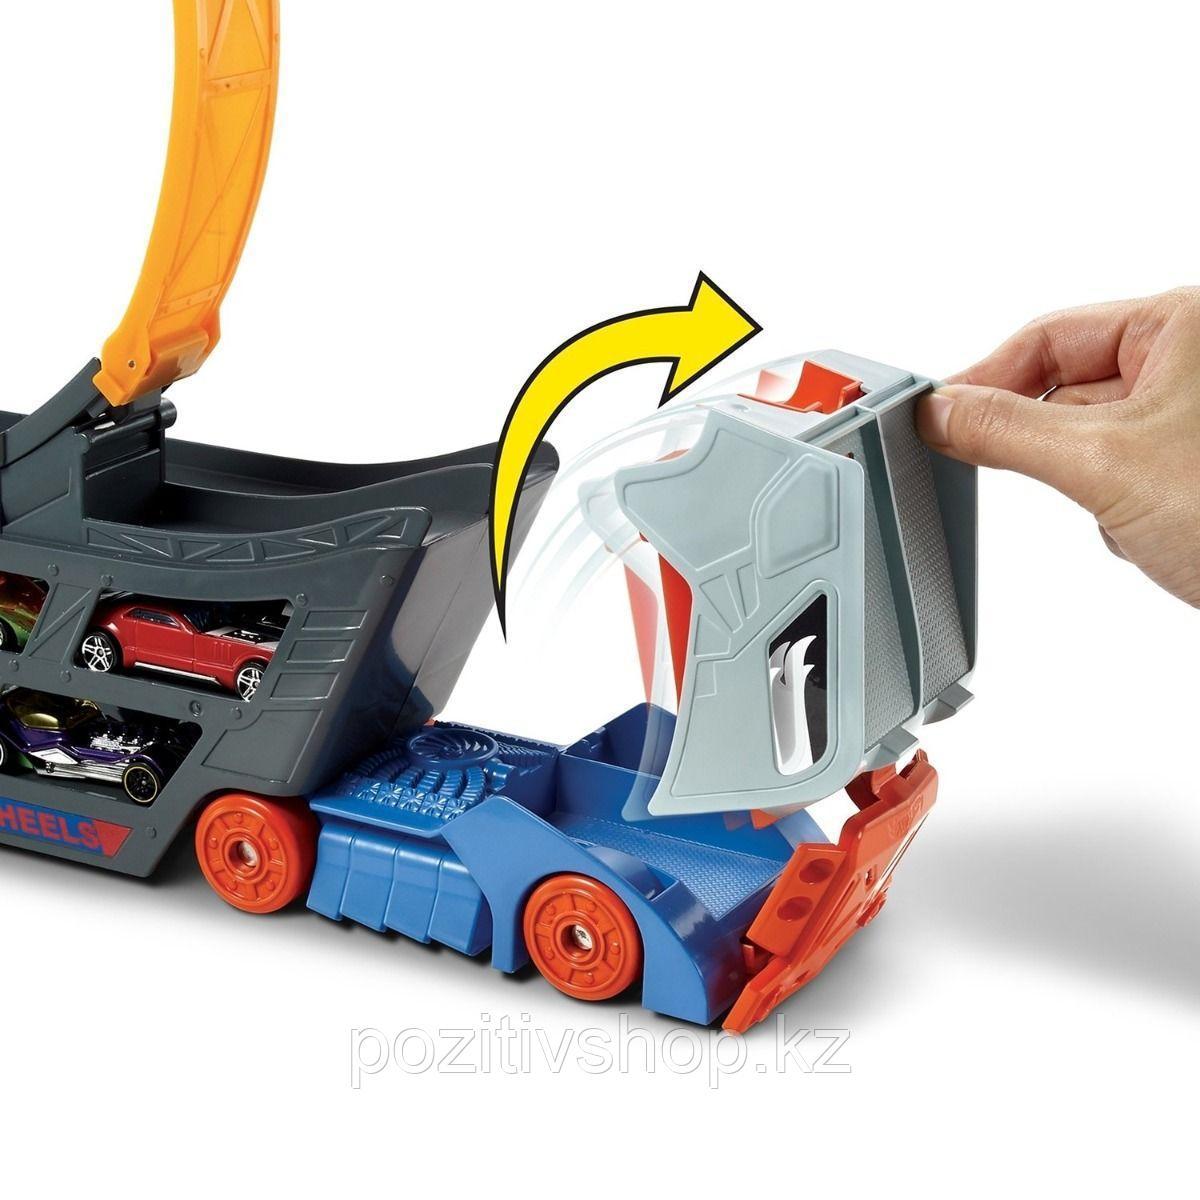 Автовоз-трансформер Hot Wheels Basic - фото 3